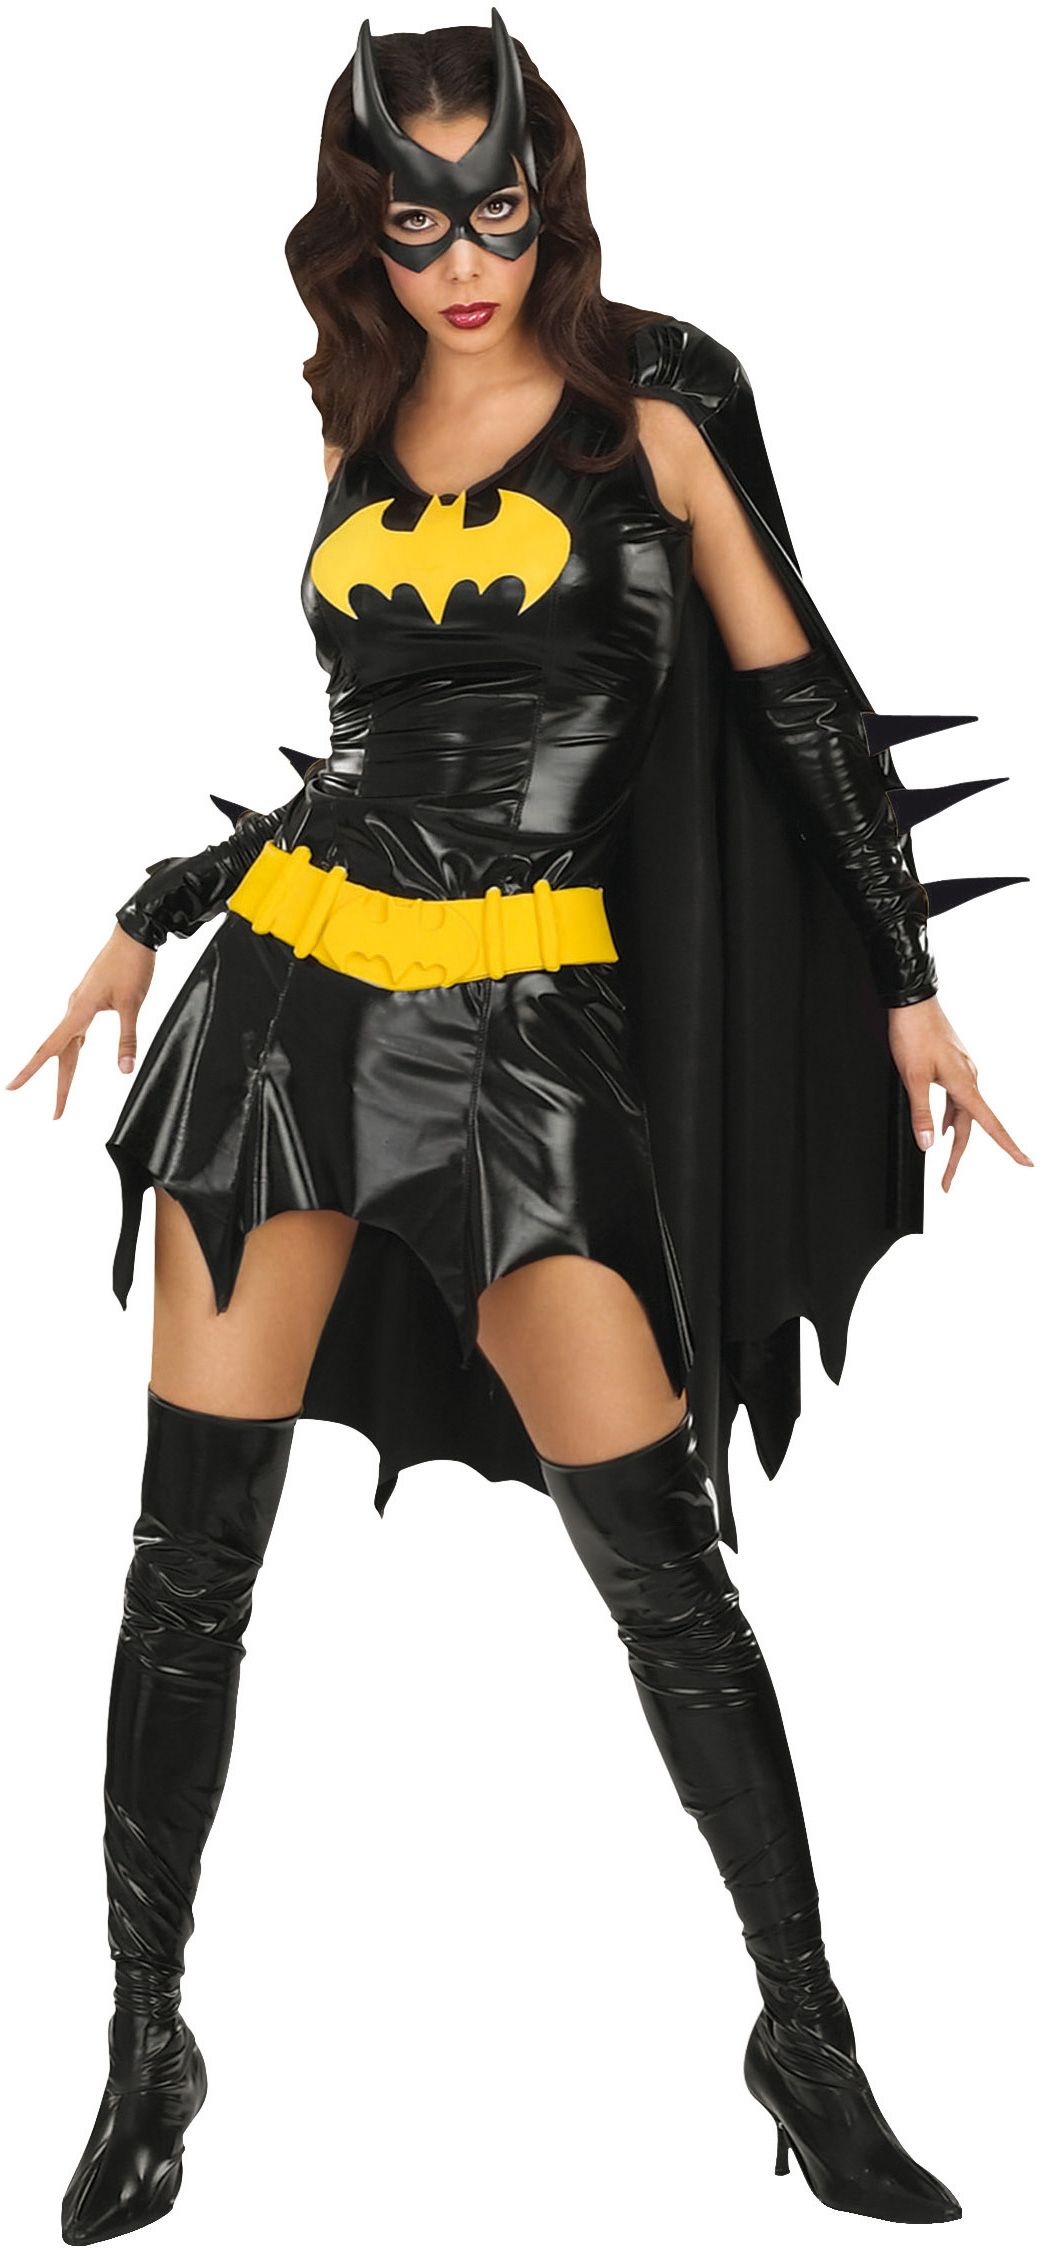 d guisement batgirl sexy femme robe courte vinyles et. Black Bedroom Furniture Sets. Home Design Ideas